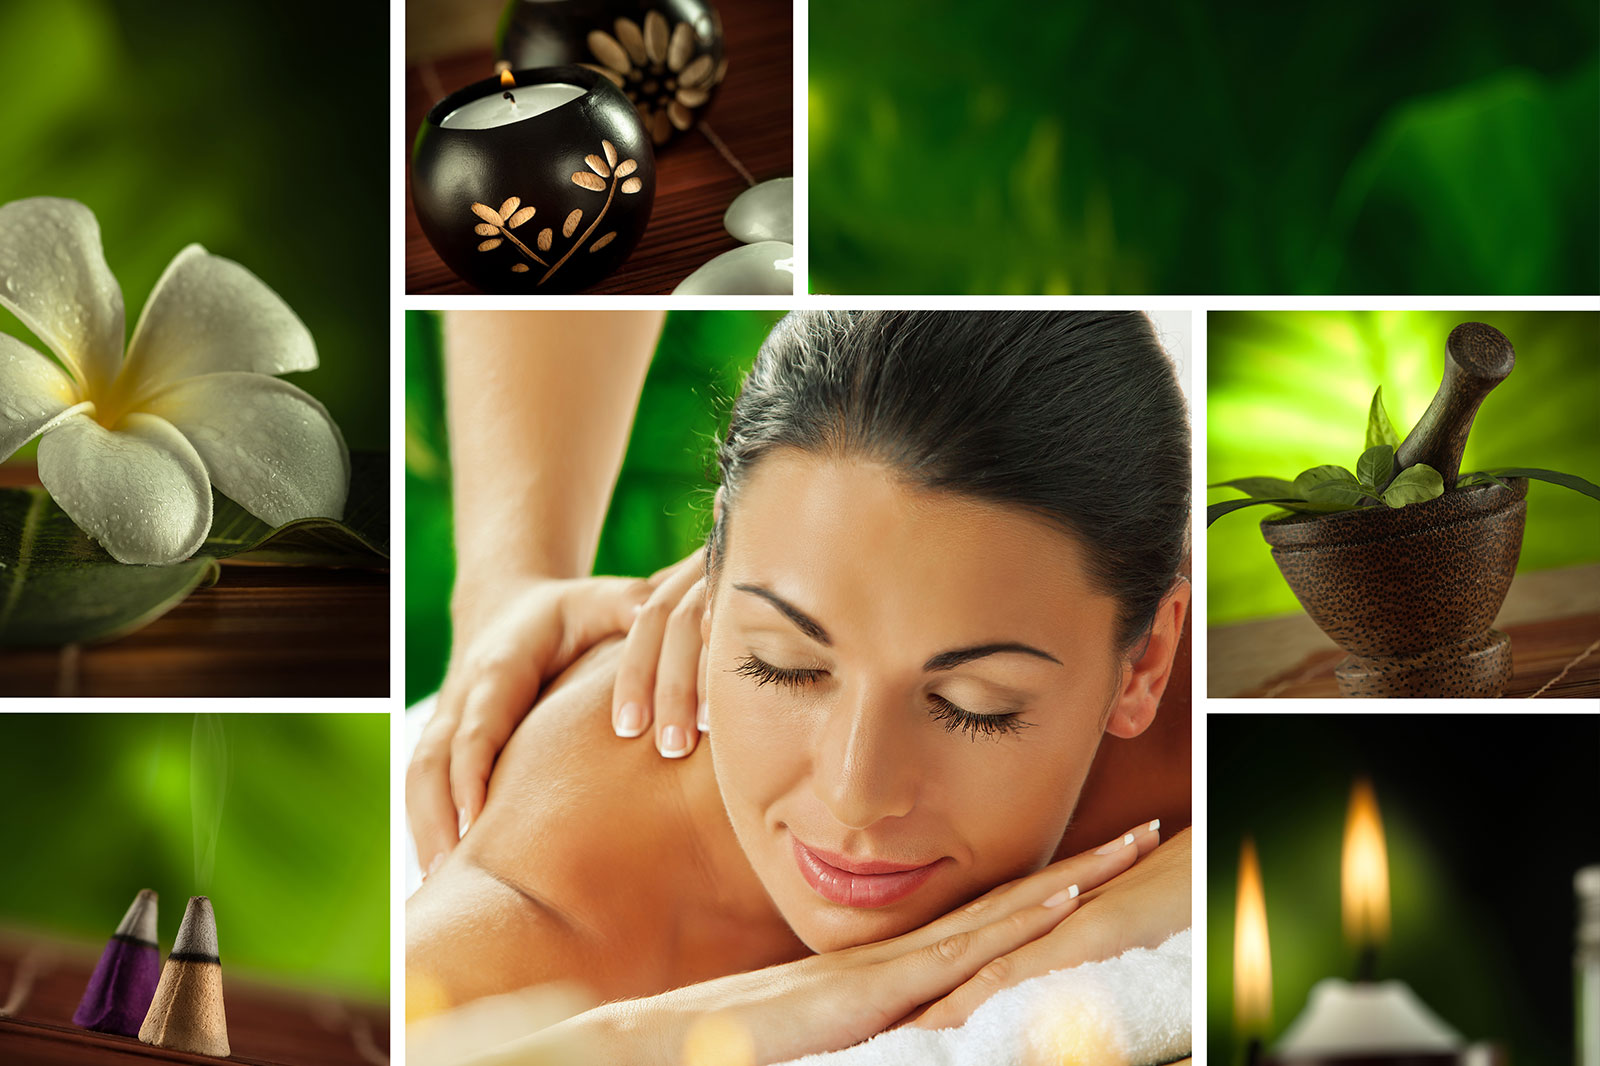 Serenity Spa & Wellness center